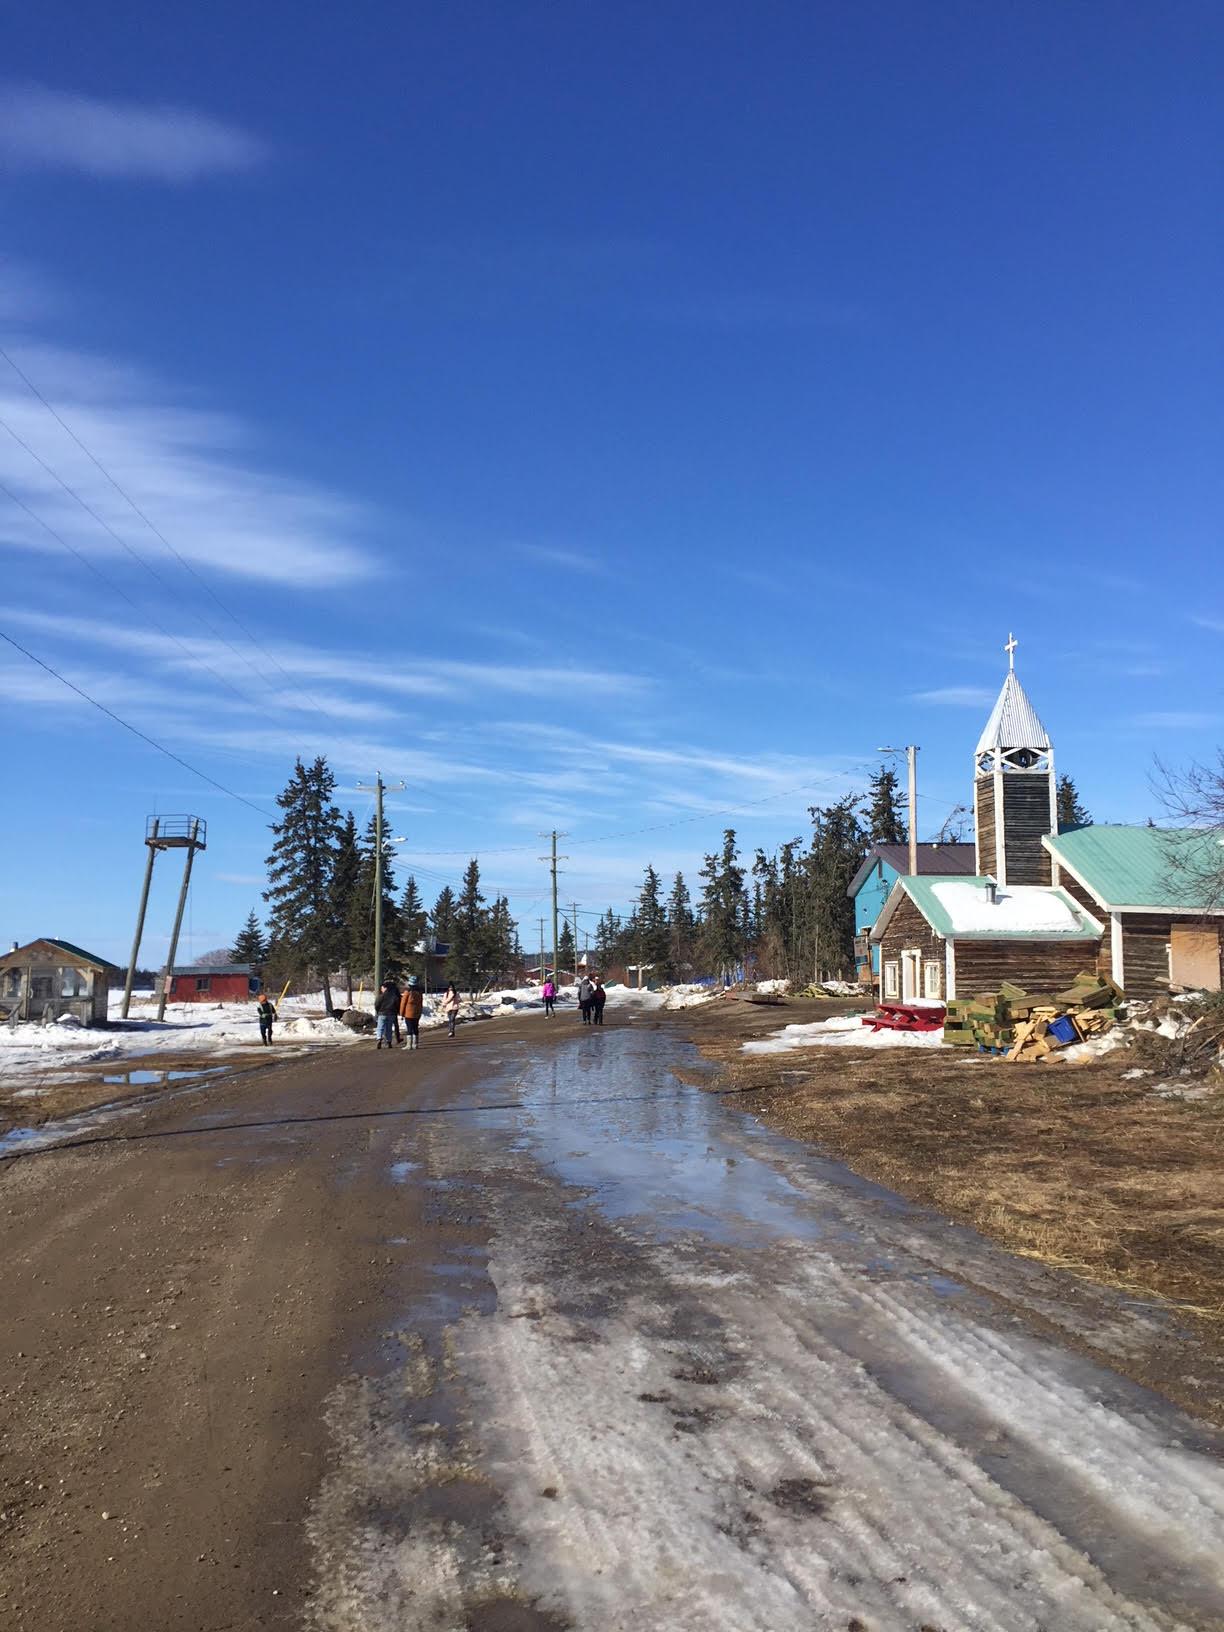 The walk toward the church